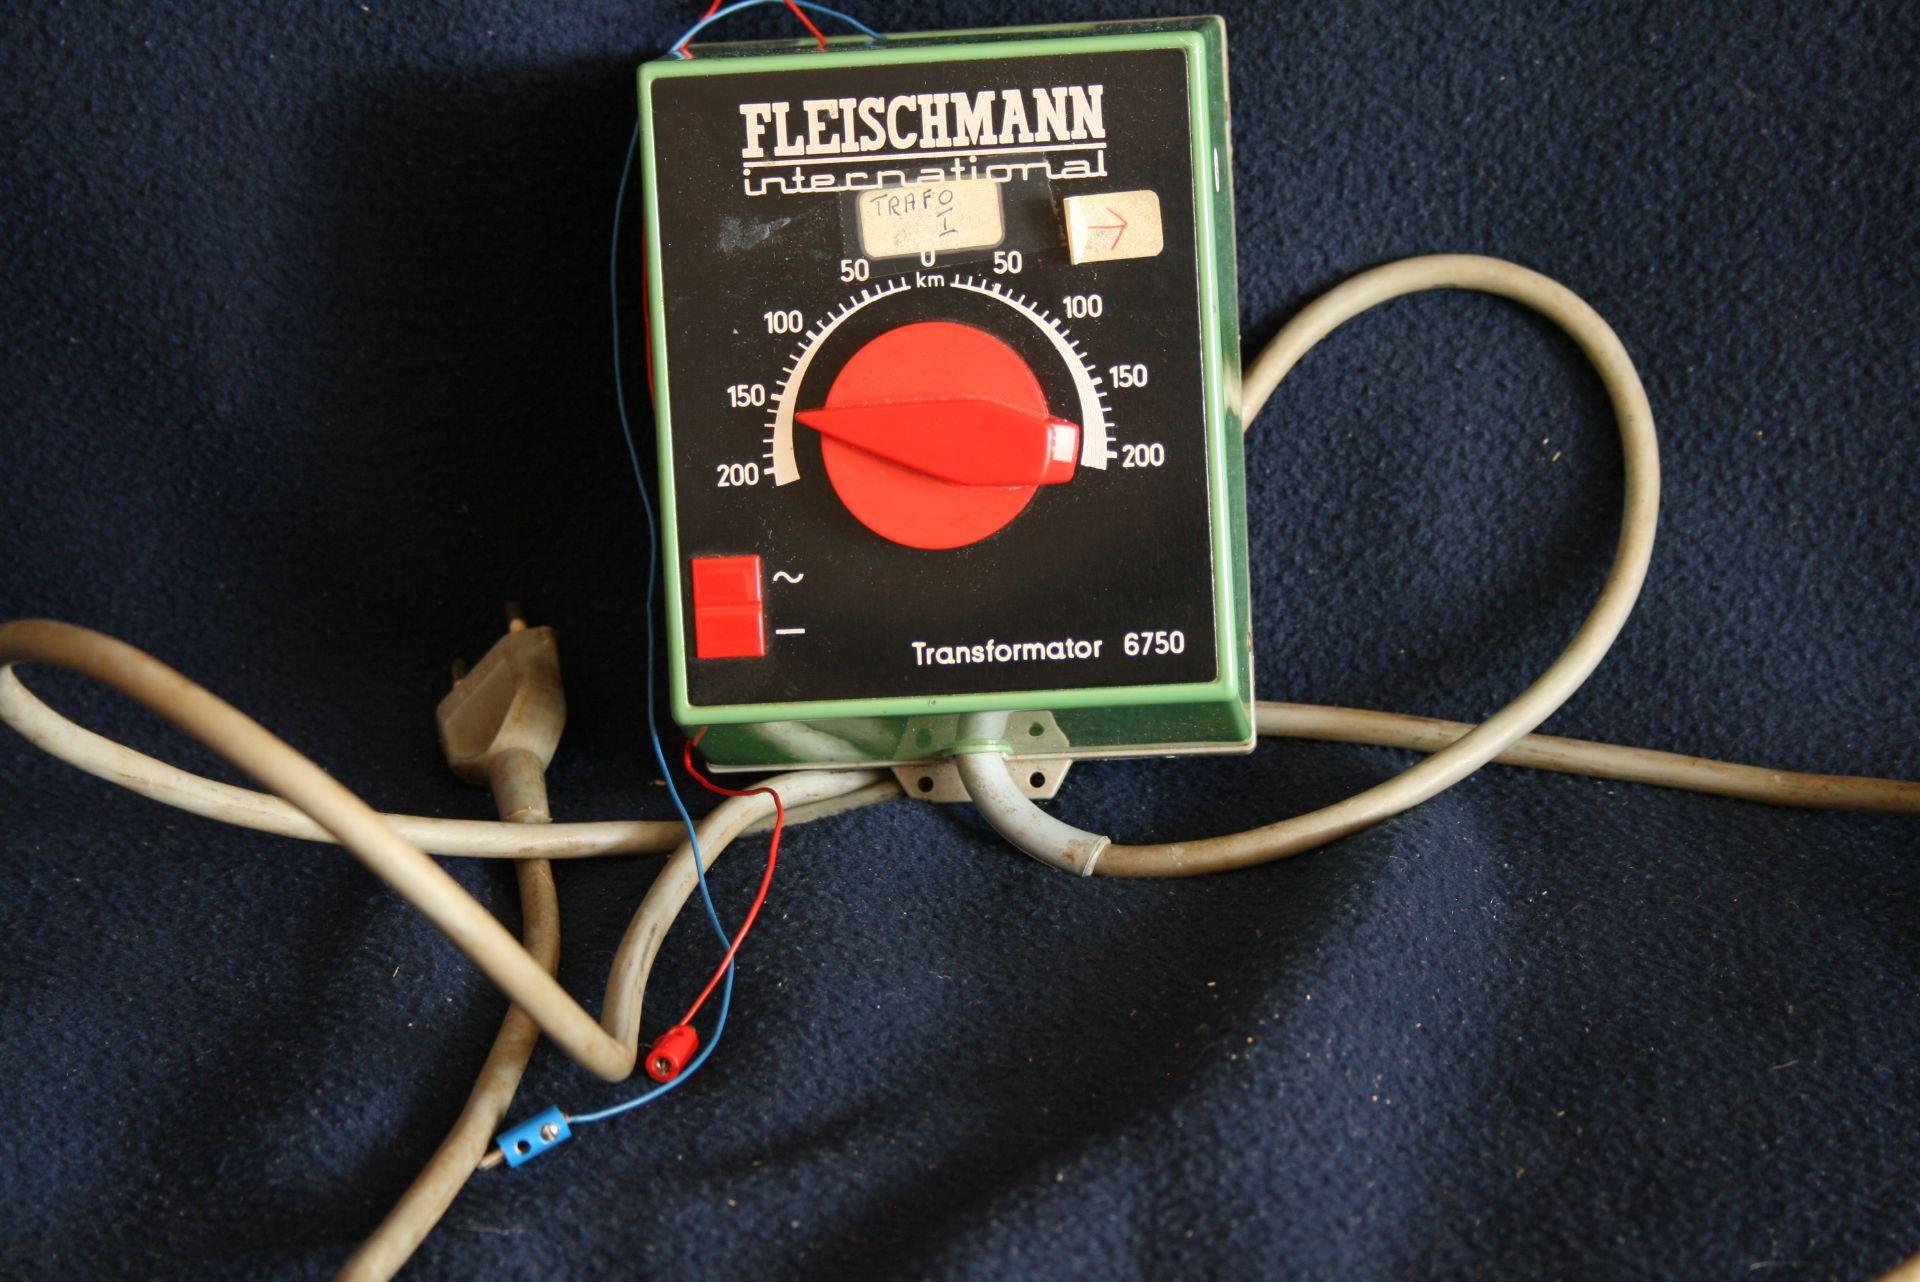 Los 25 - Fleischmann 6750, transformateur électrique - - Fleischmann 6750 - Power [...]